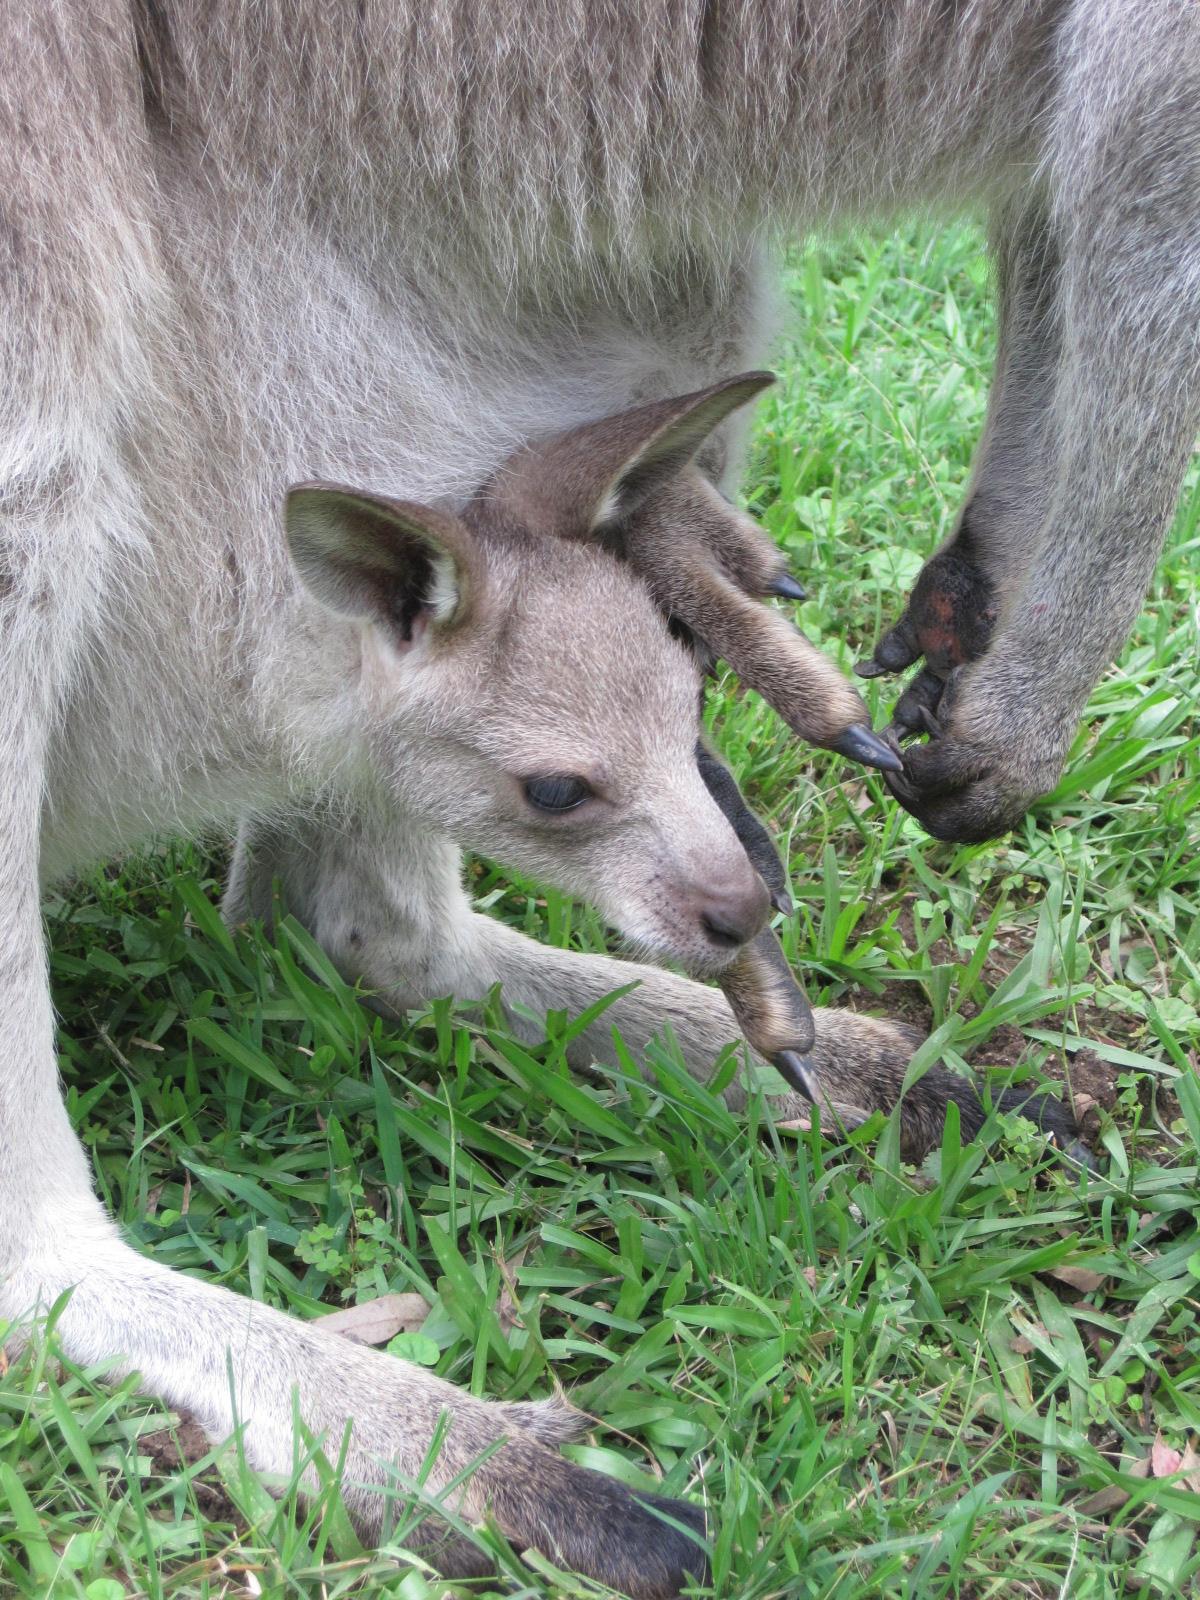 Kangaroos Of The Scrubby Bush Kangaroo Joey Pouches Merrilyn Part 2